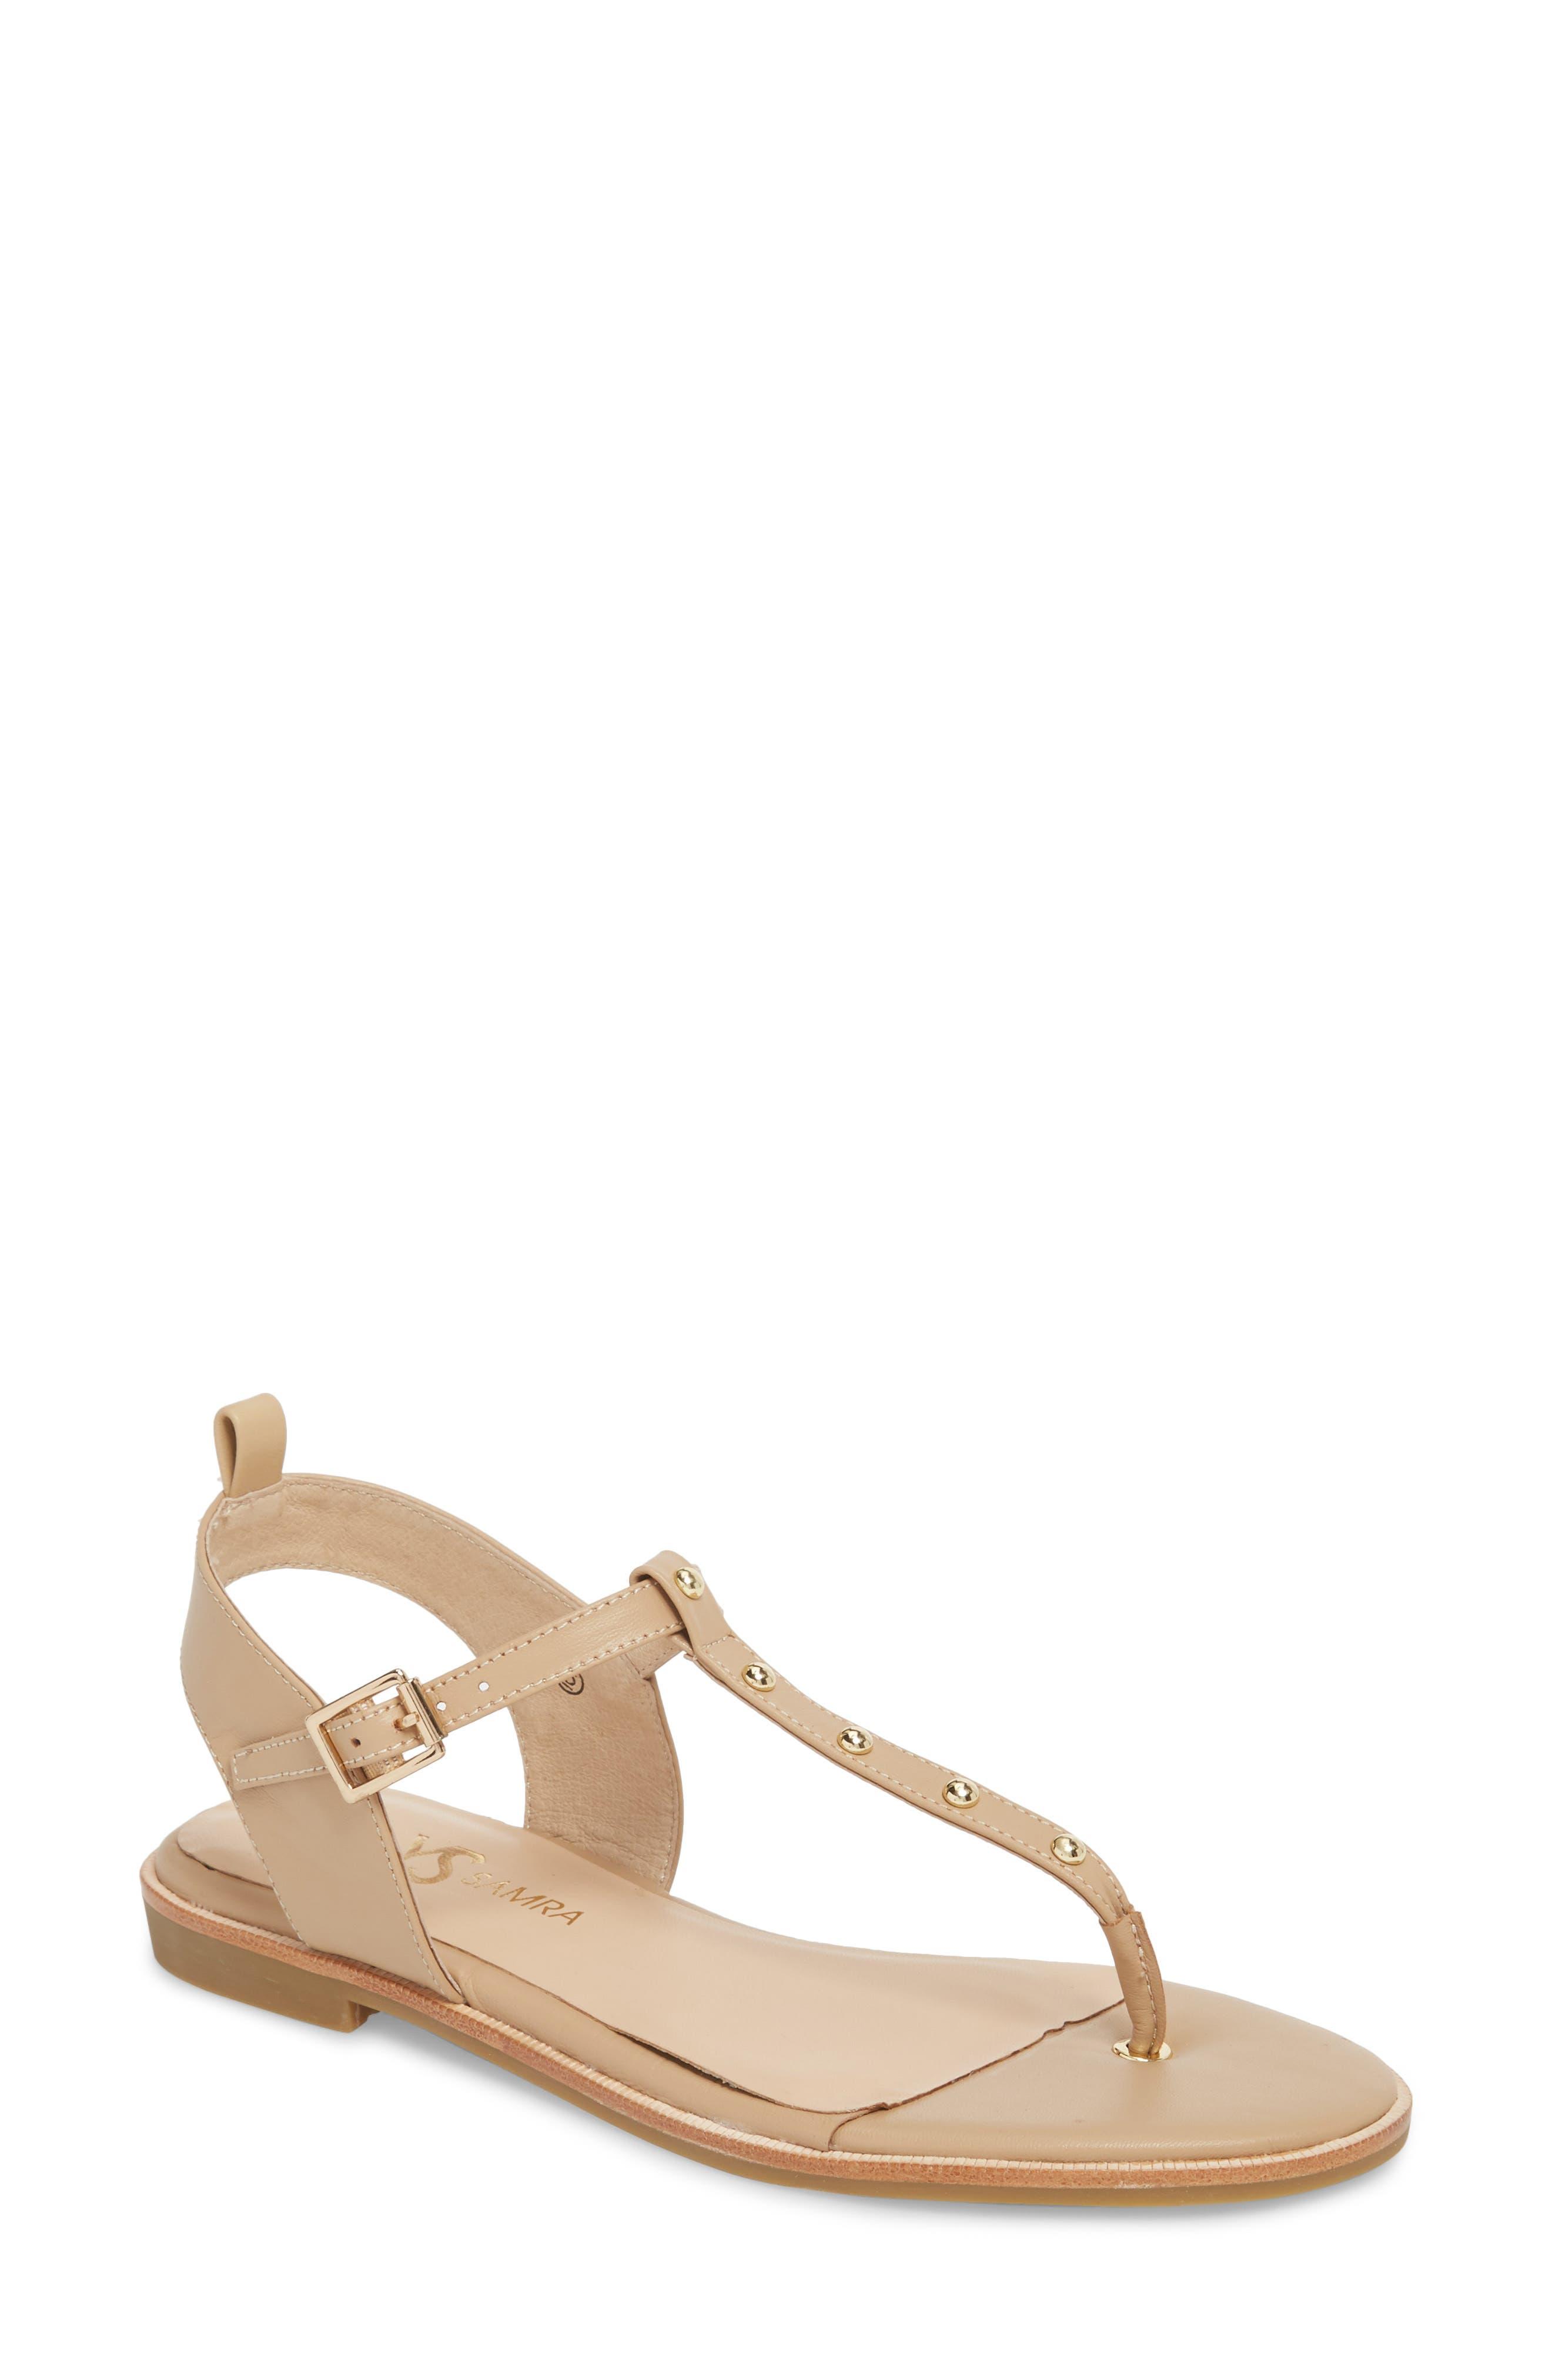 Calliste Sandal,                         Main,                         color, Camel/ Gold Studs